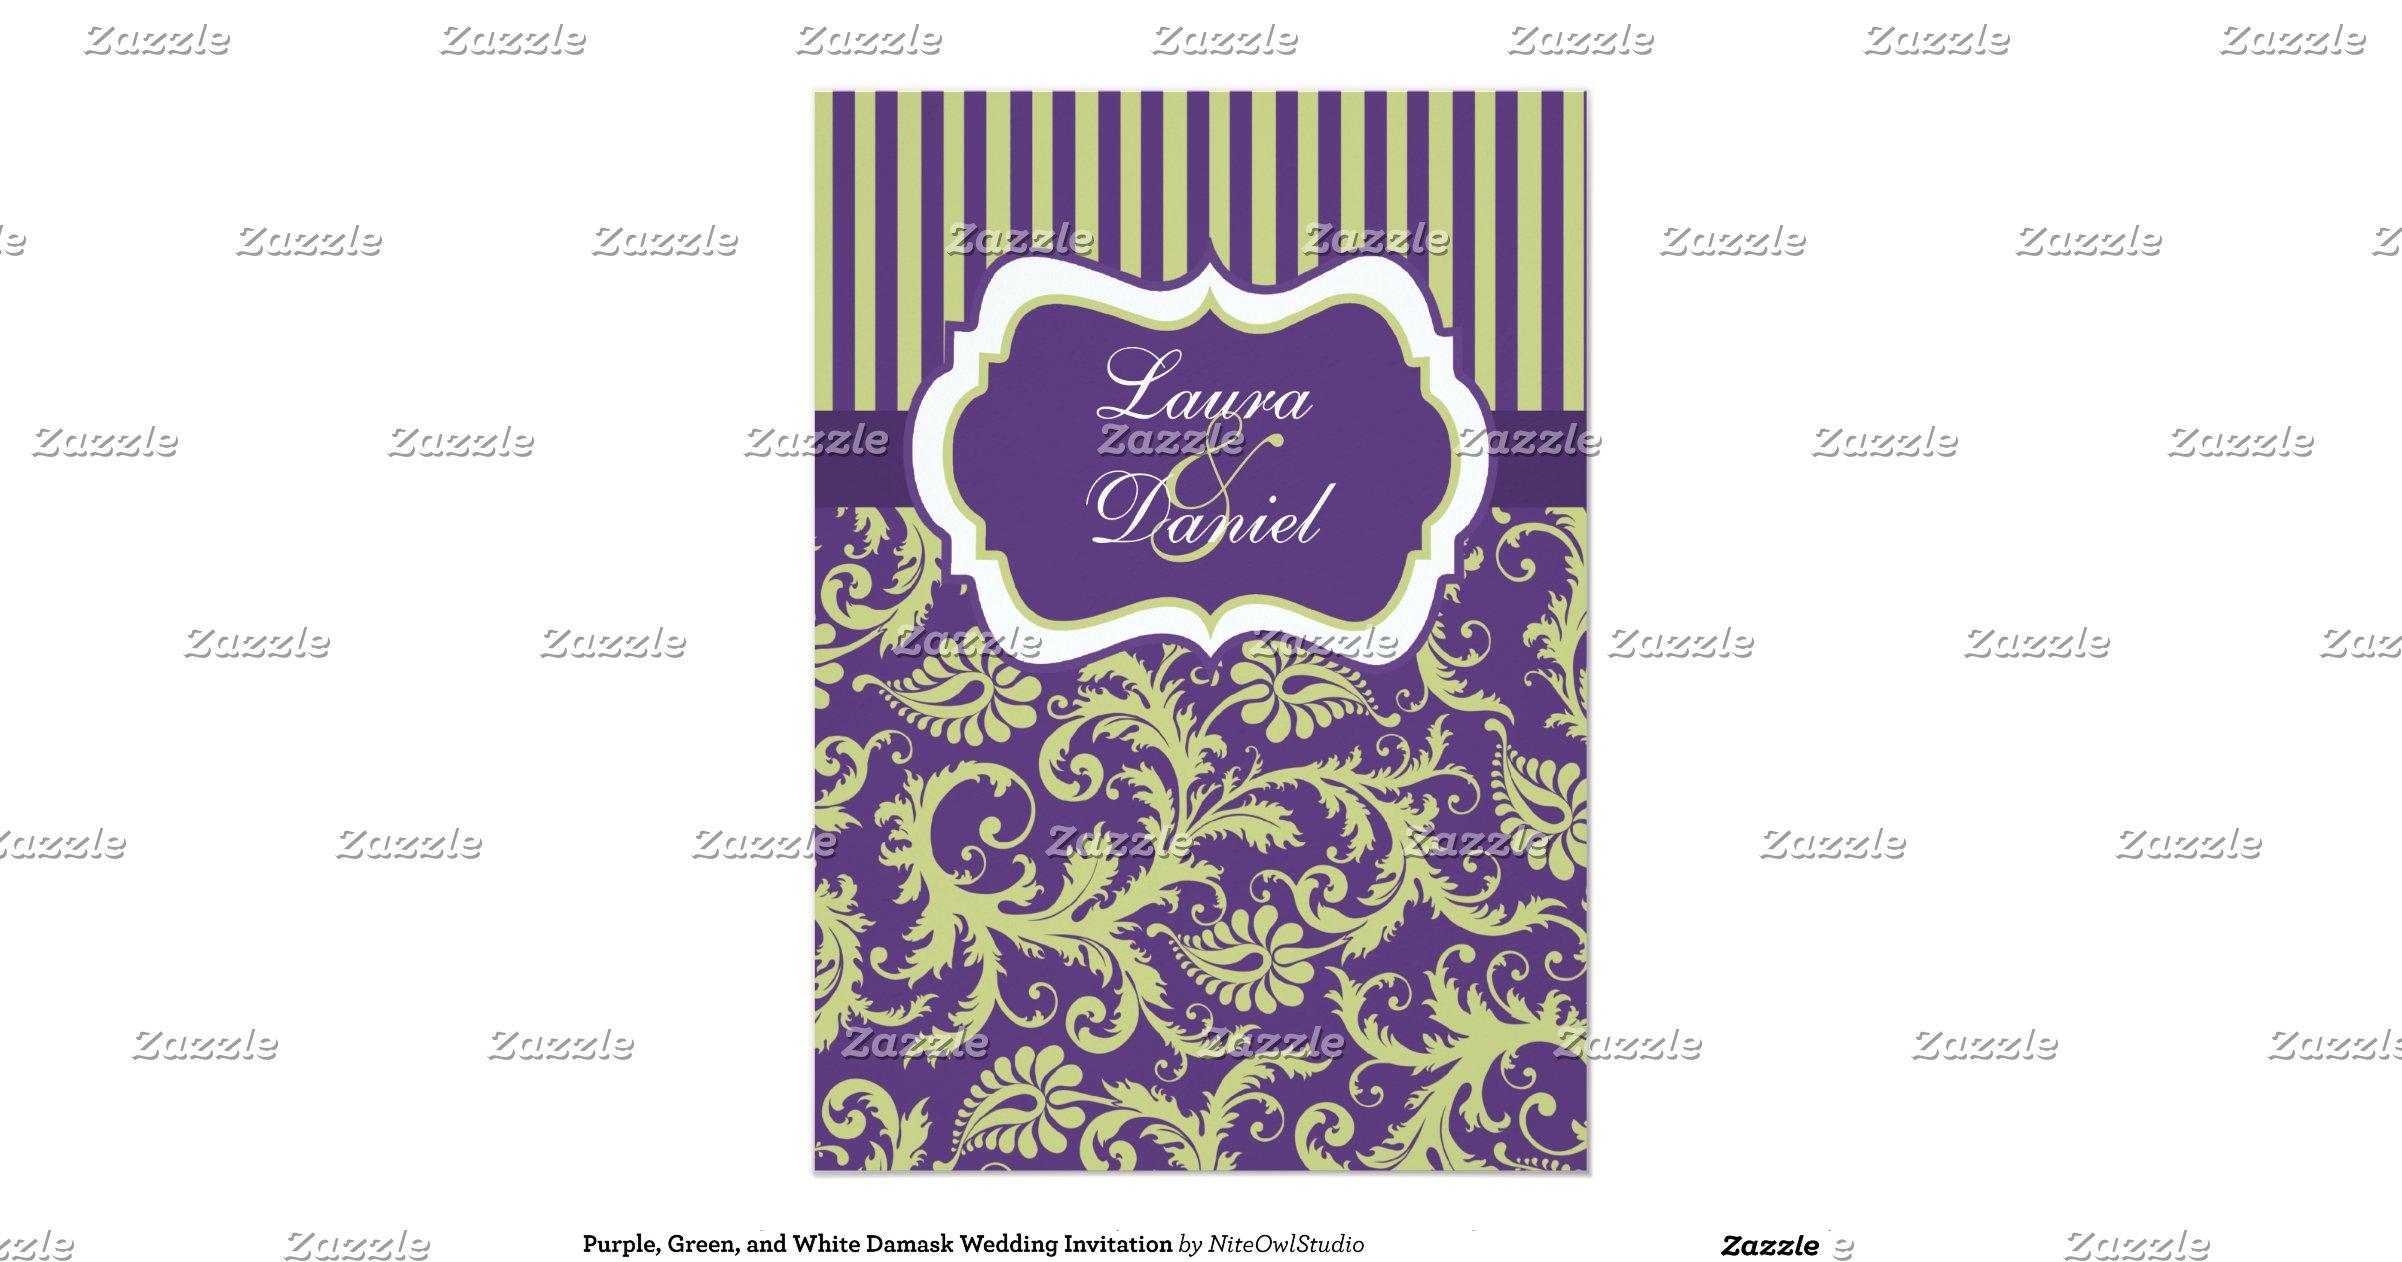 White And Green Wedding Invitations: Purple_green_and_white_damask_wedding_invitation